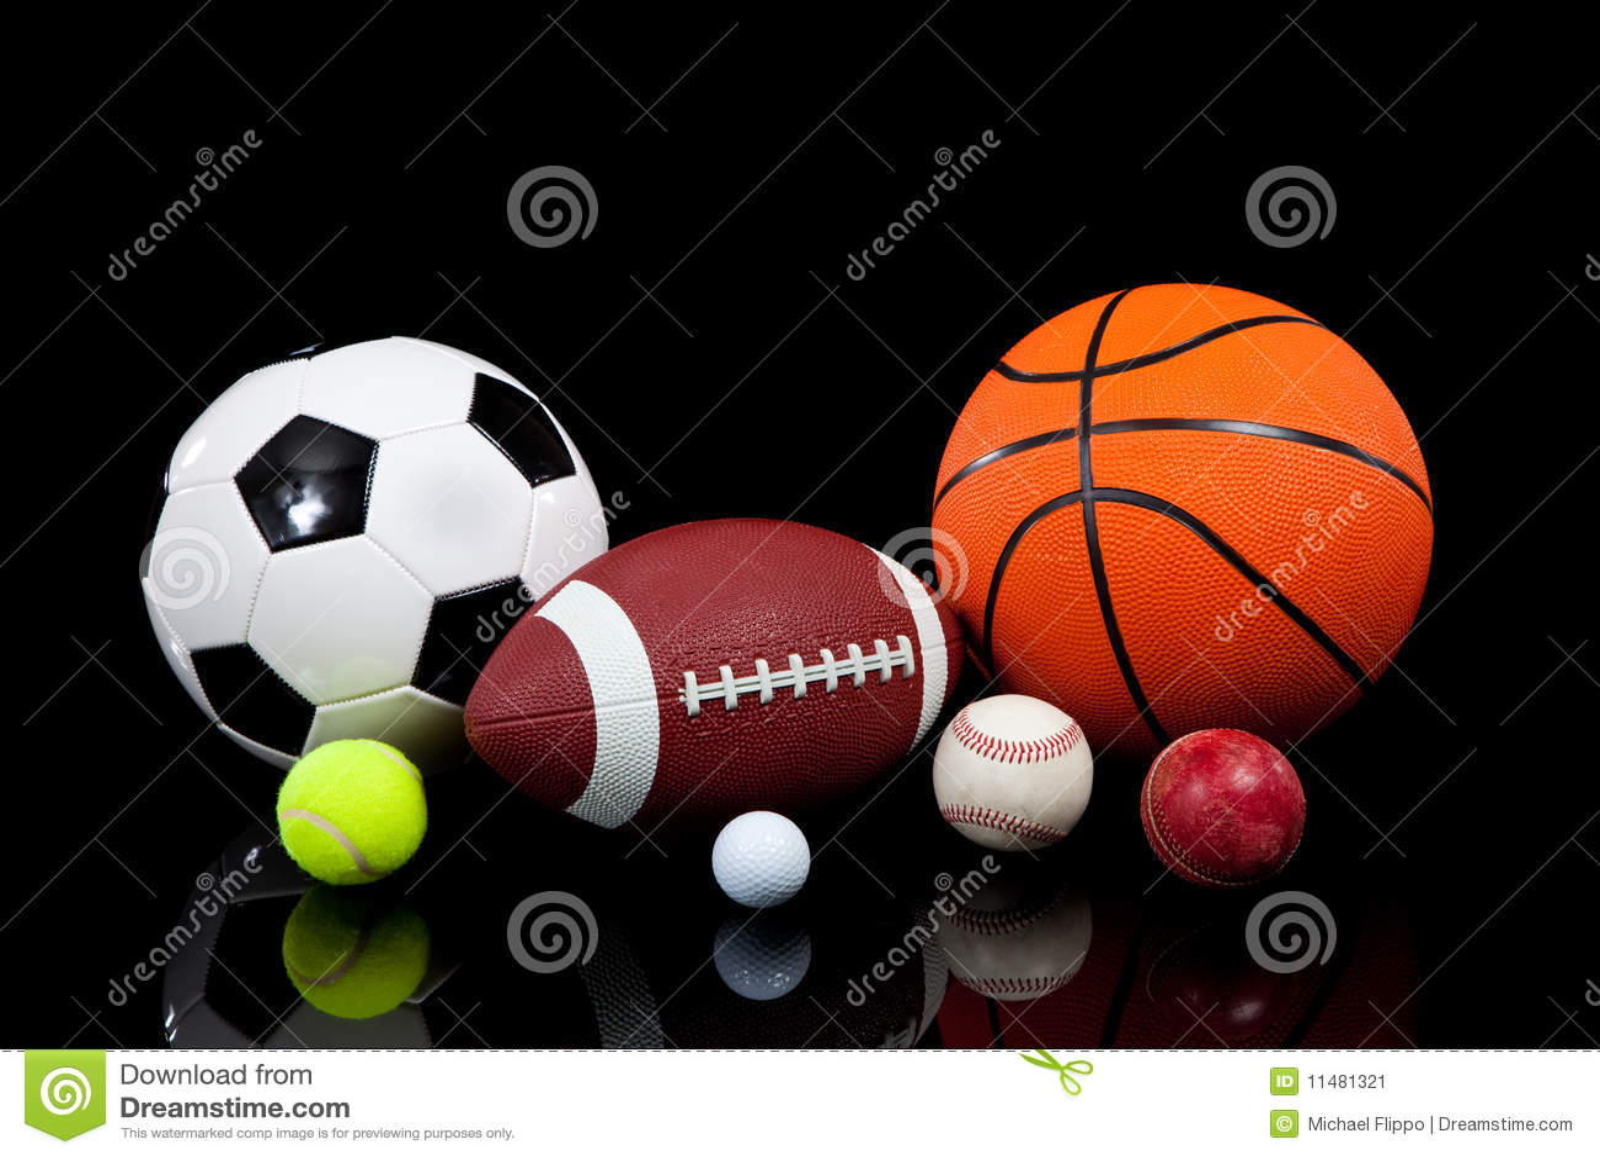 Billes Assorties De Sports Sur Un Fond Noir Image Stock